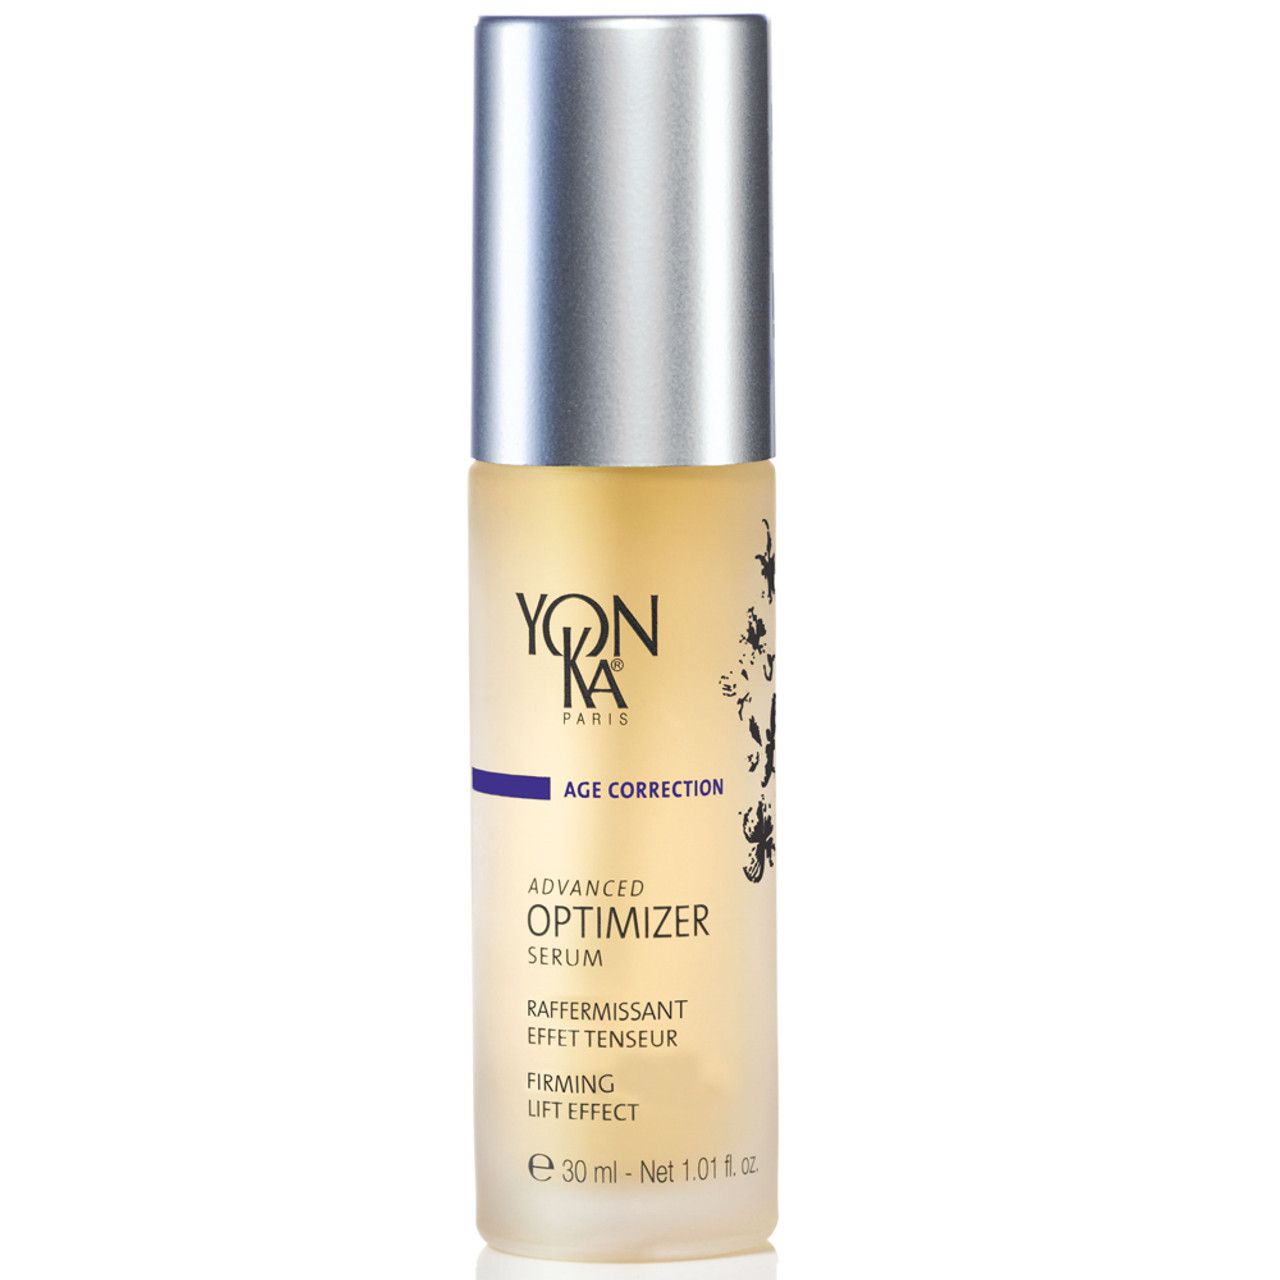 YonKa Advanced Optimizer Serum BeautifiedYou.com